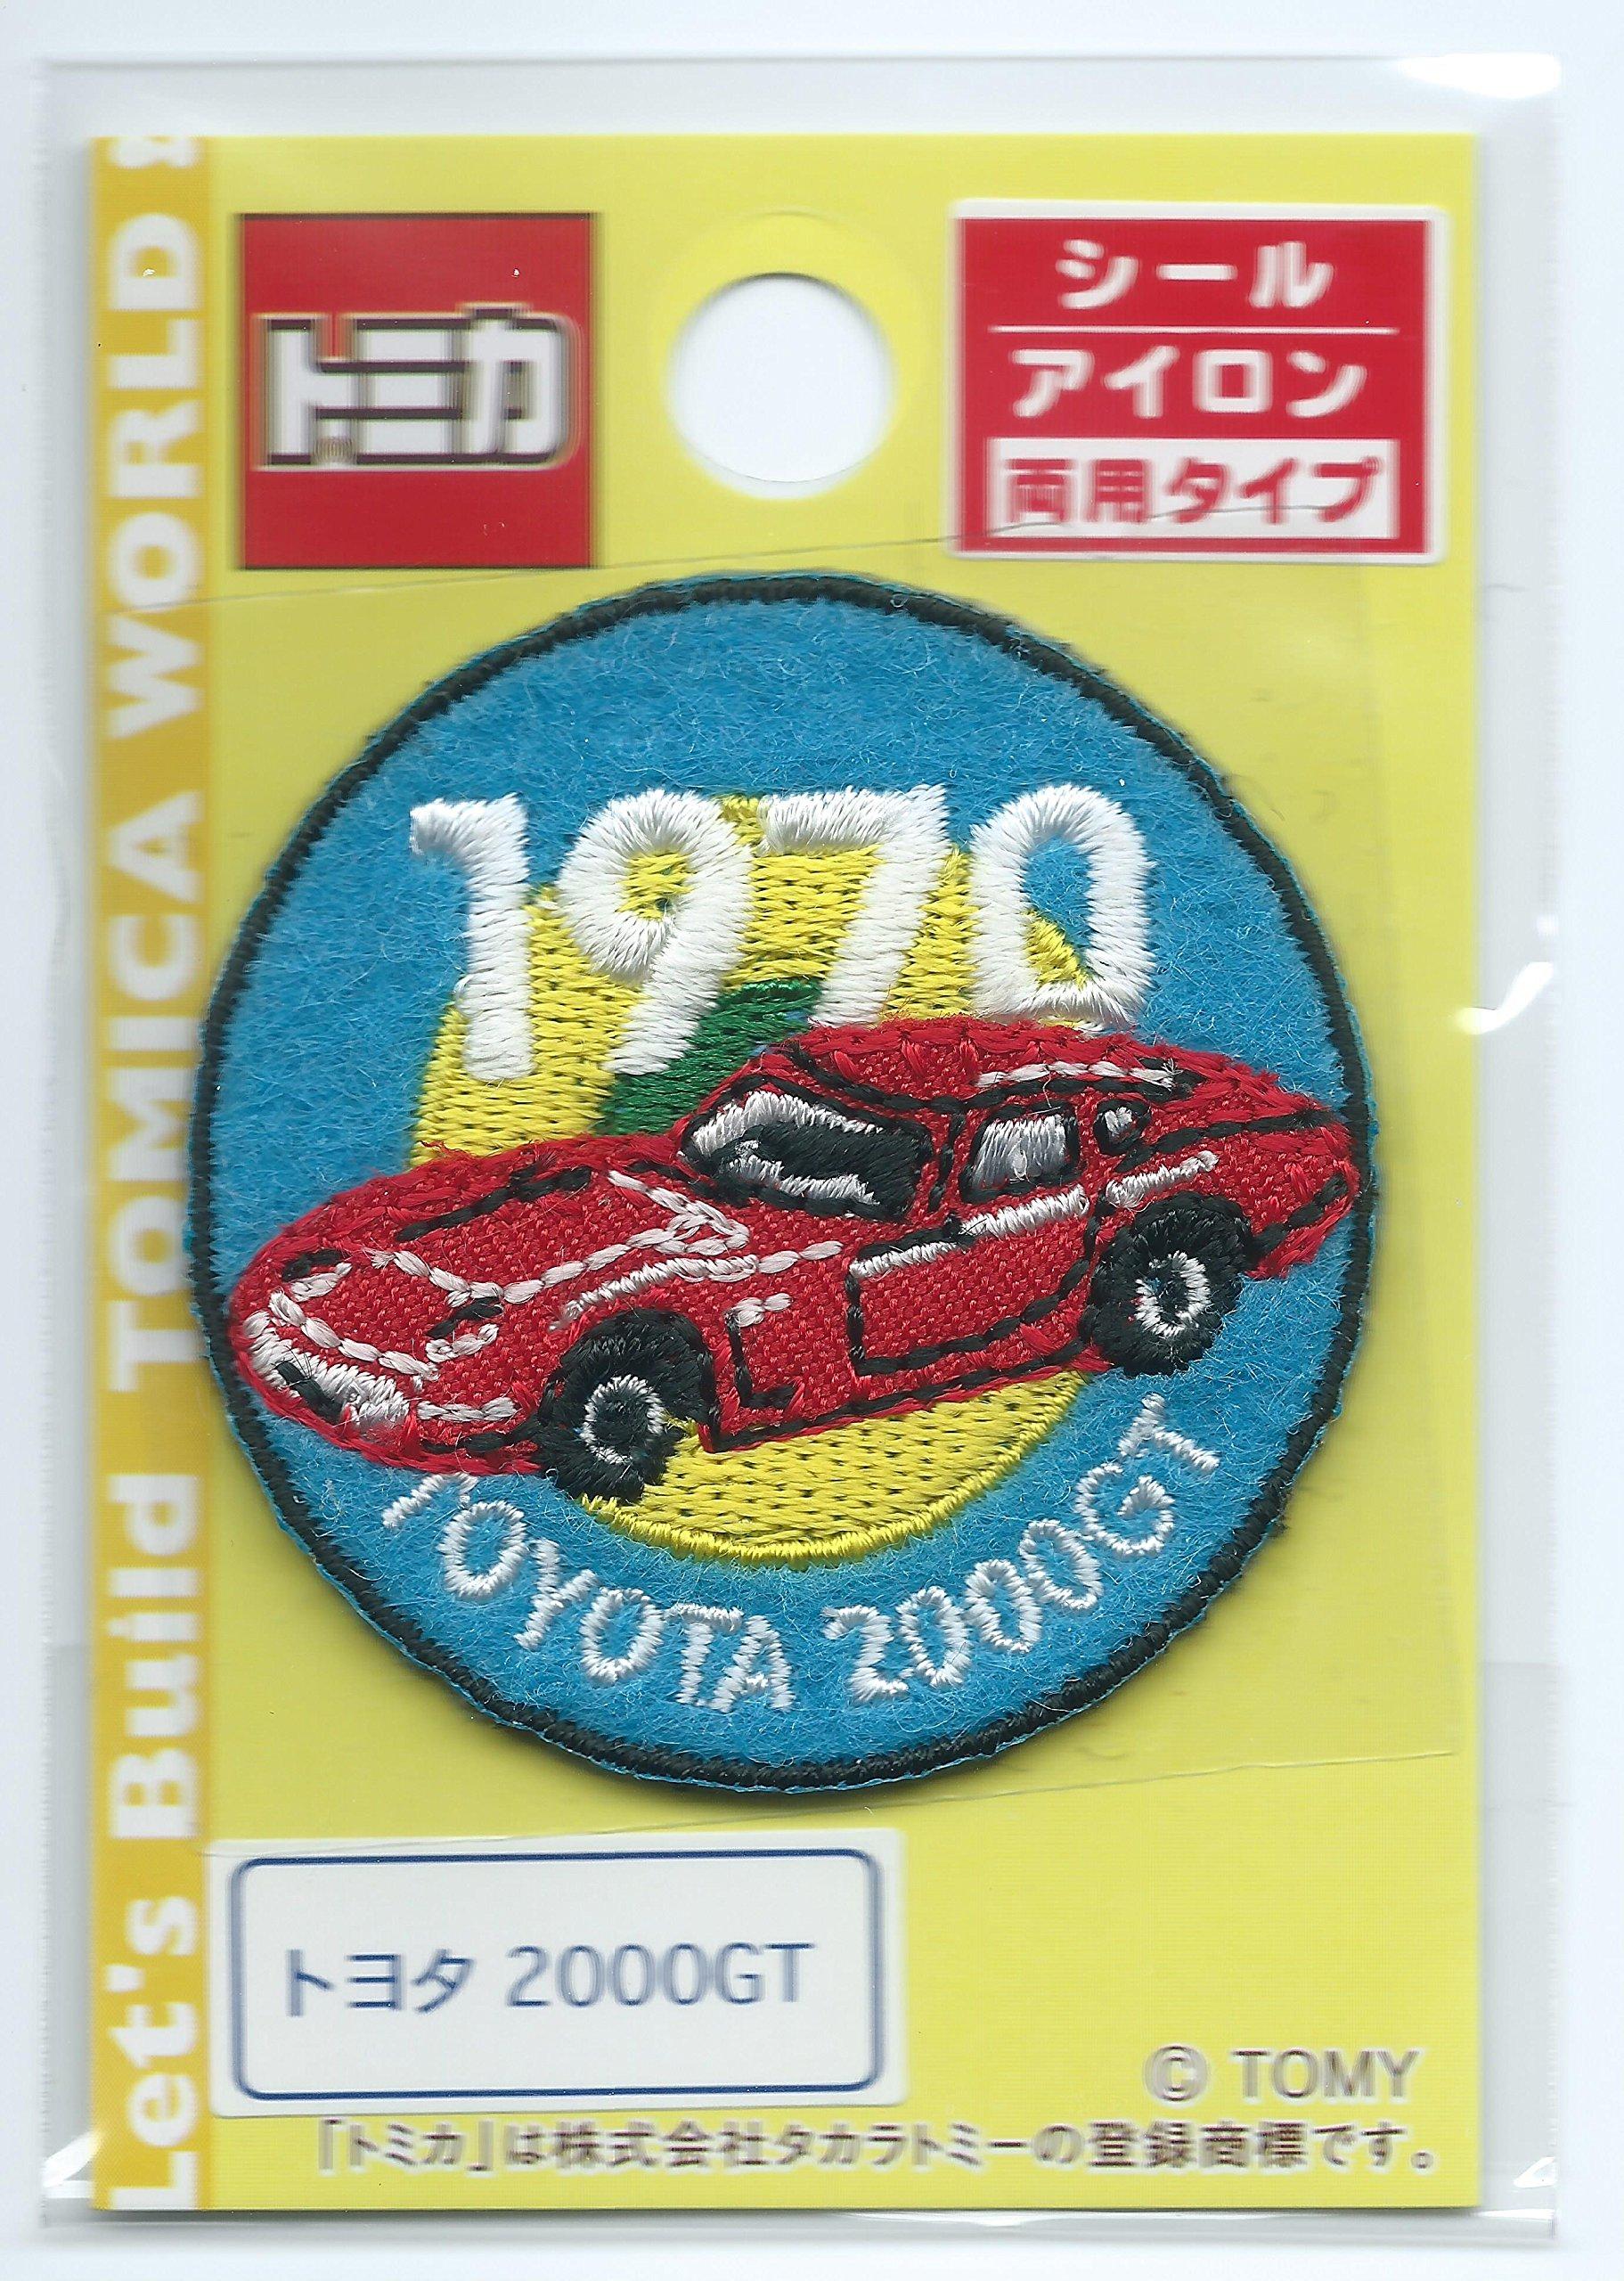 Toyota 2000GT 5 pieces of applique